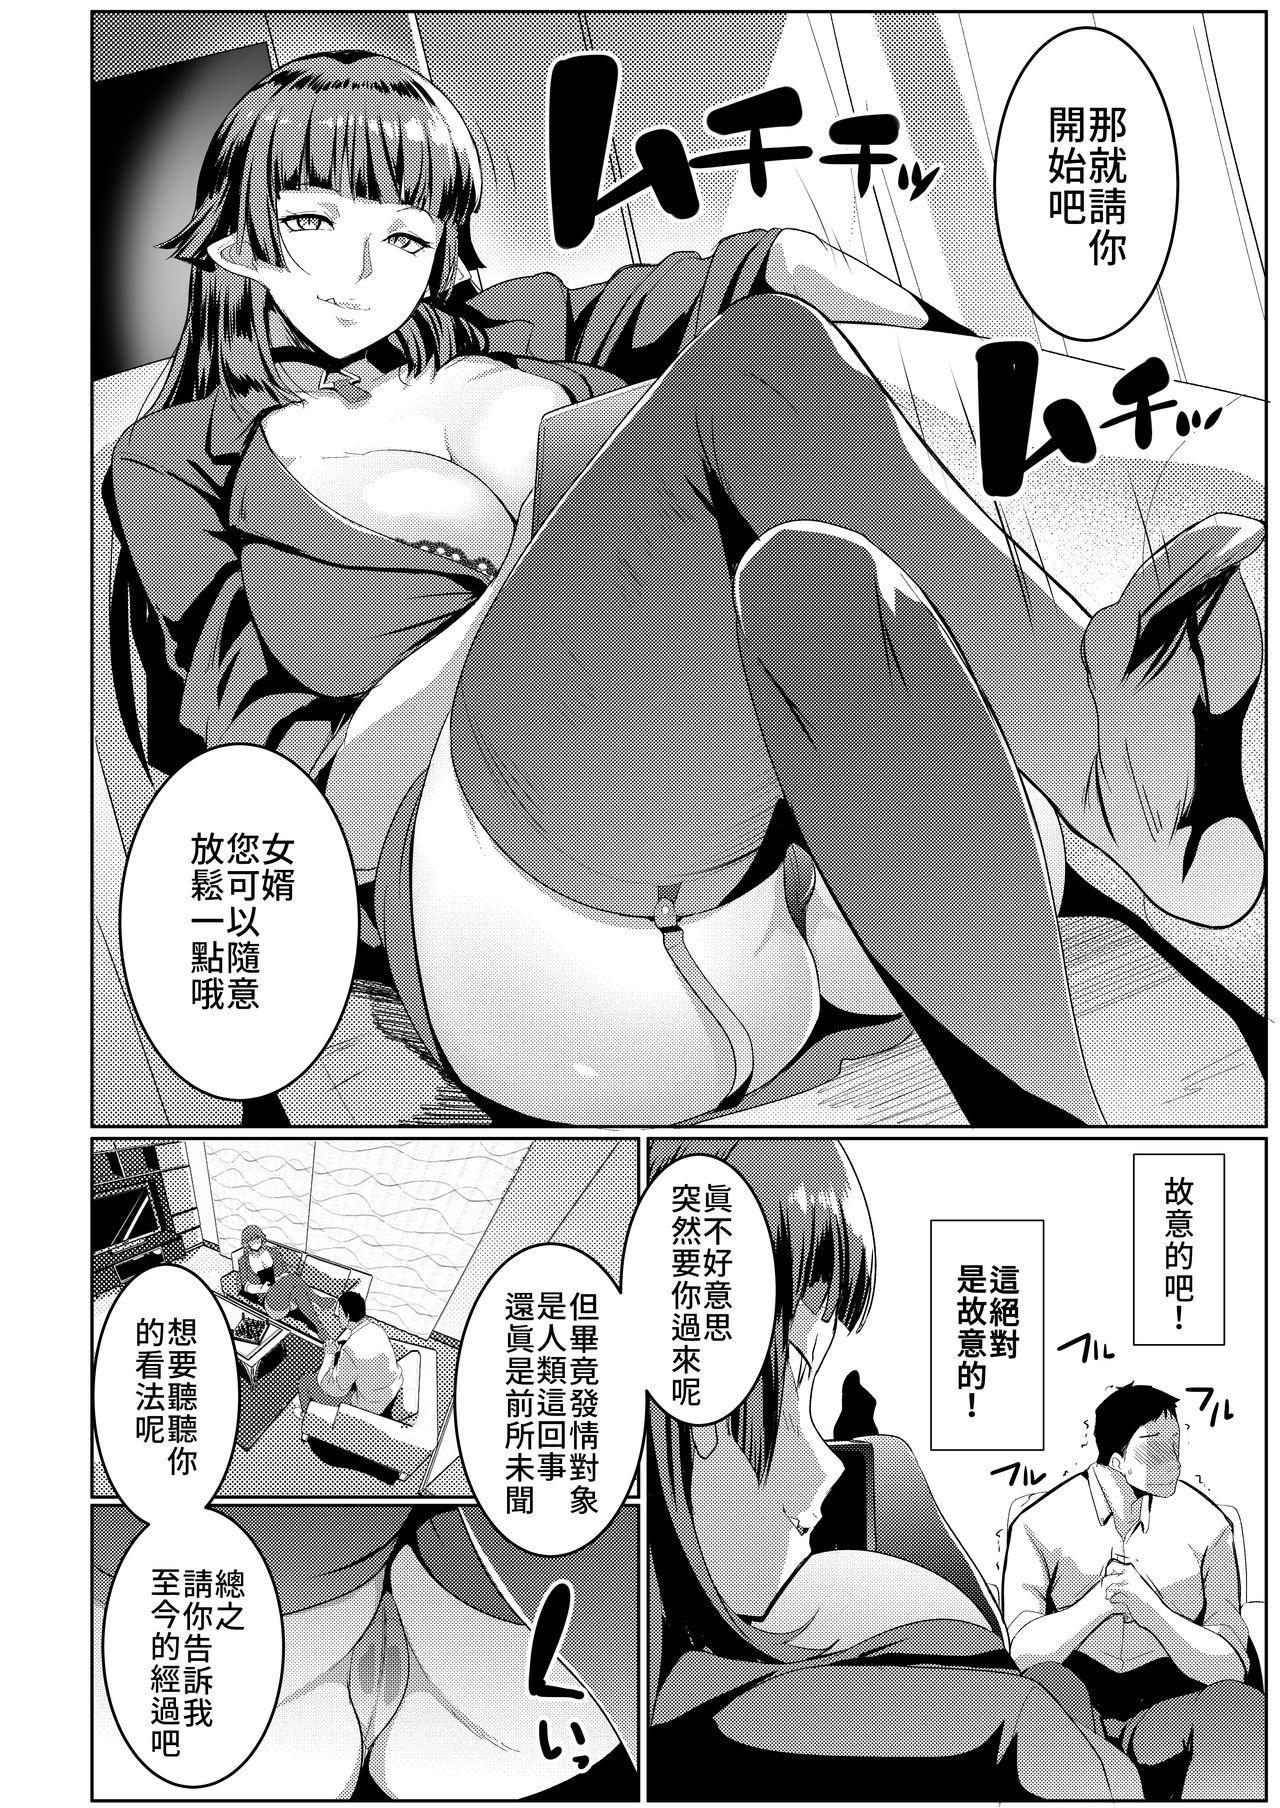 Imouto wa Mesu Orc 3   我家妹妹是雌性獸人3 5